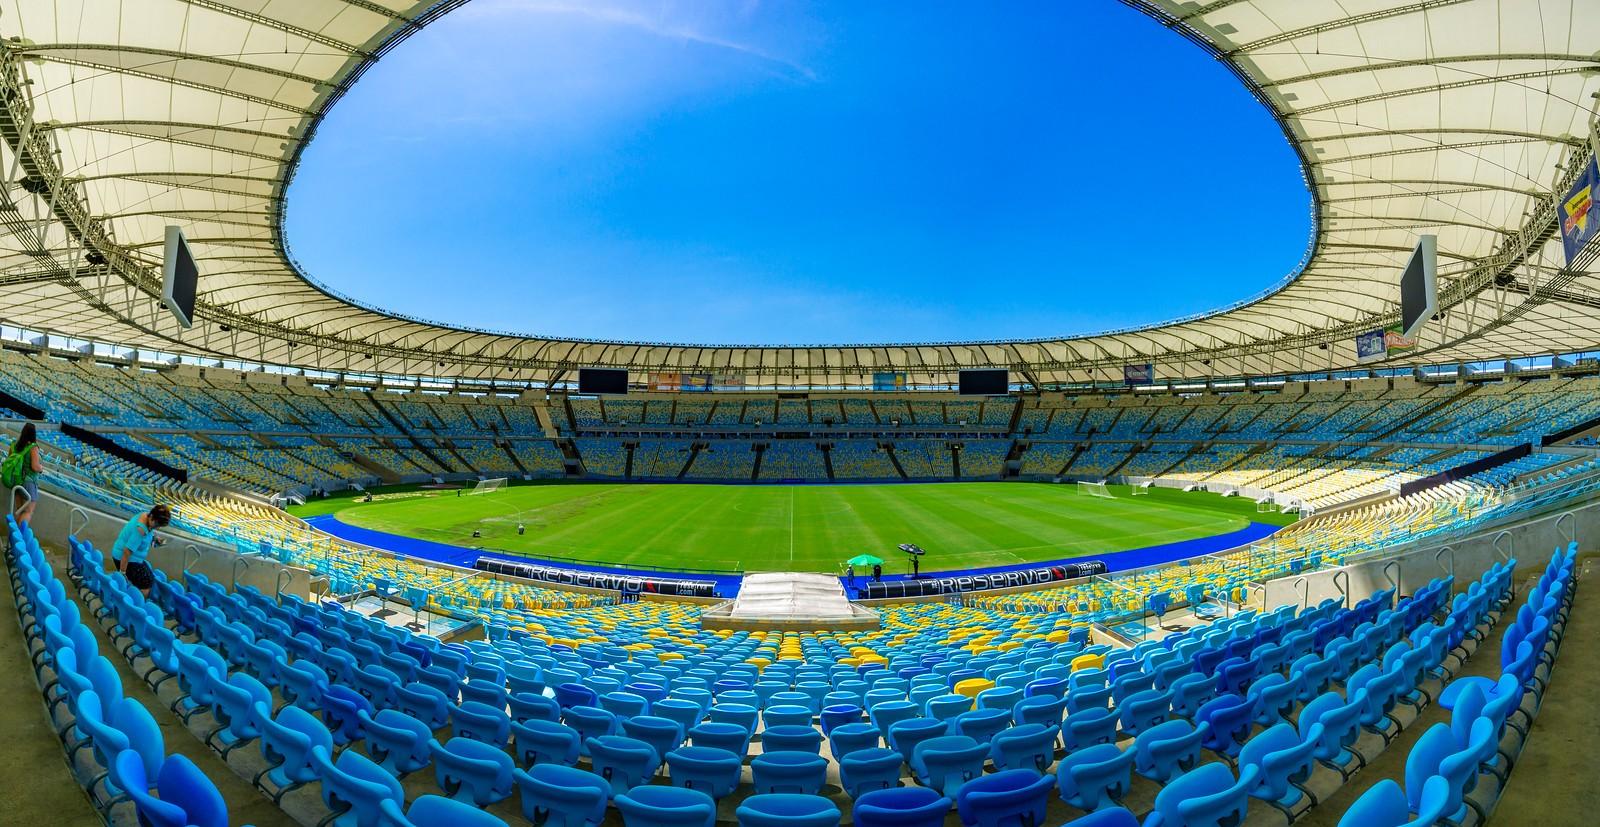 Estadio Maracana - Jornalista Mario Filho or Rei Pele?